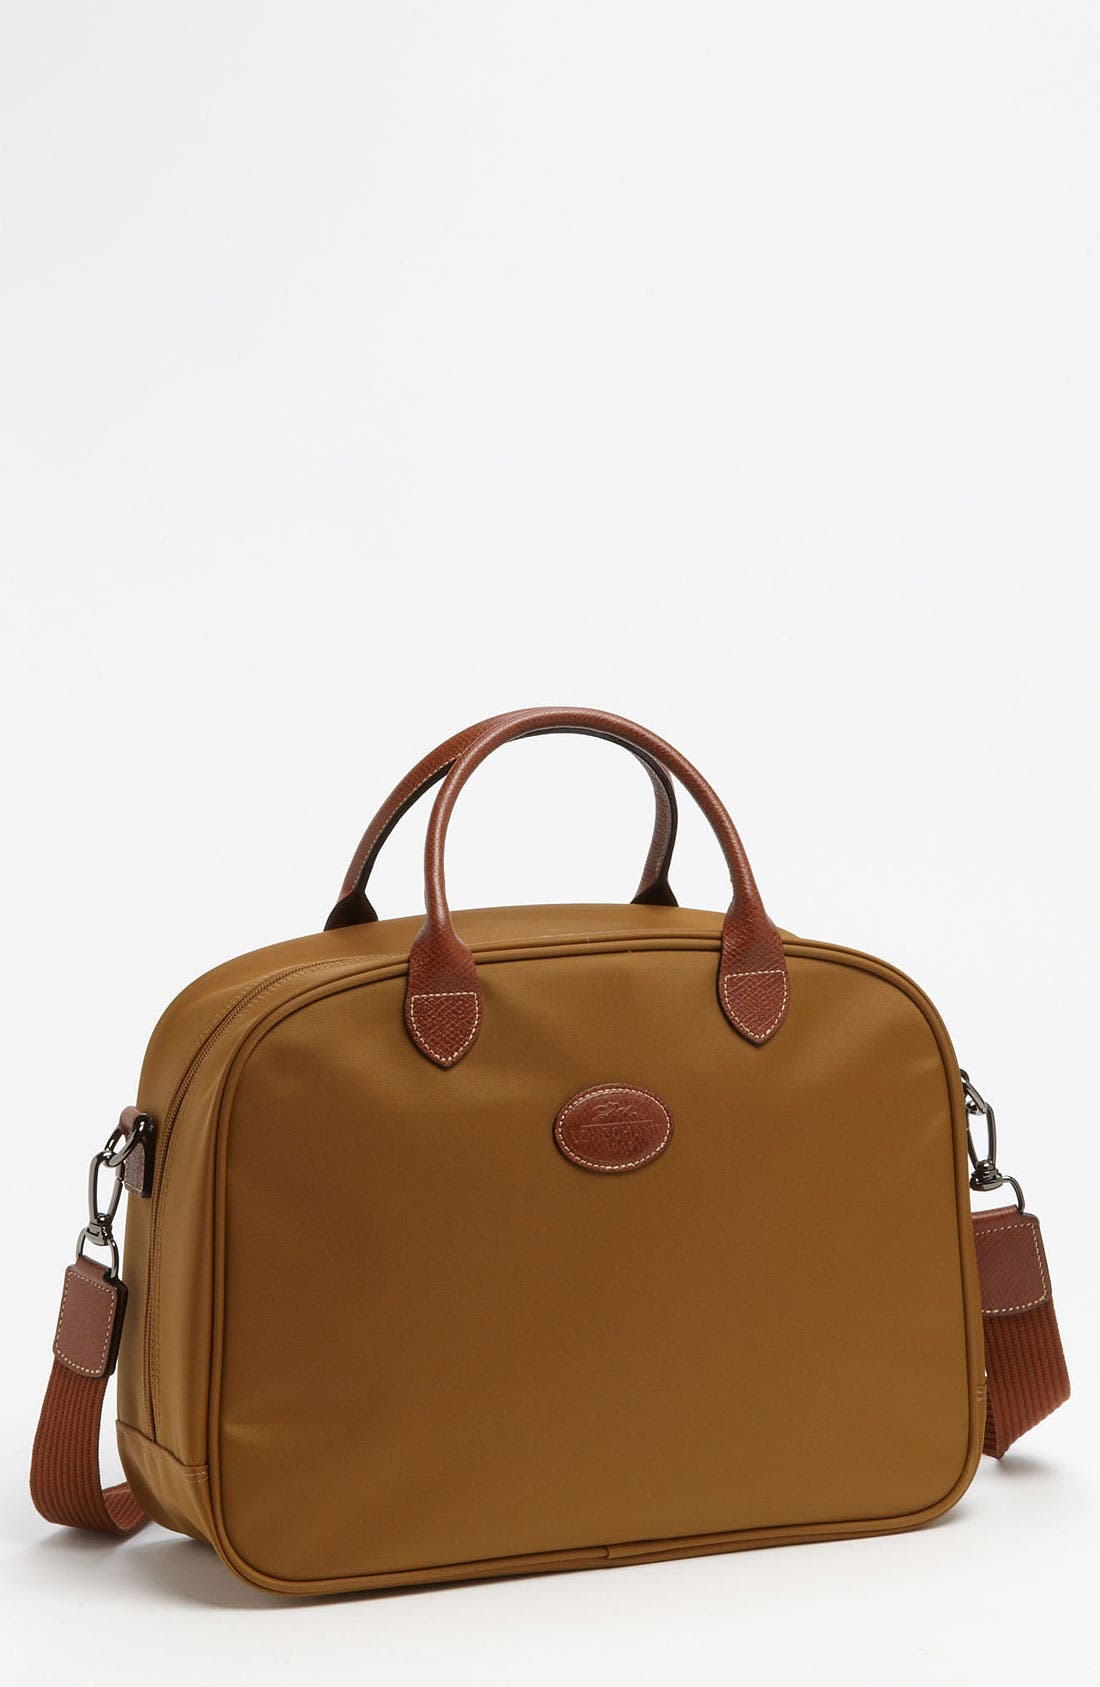 Main Image - Longchamp 'Le Pliage' Travel Bag